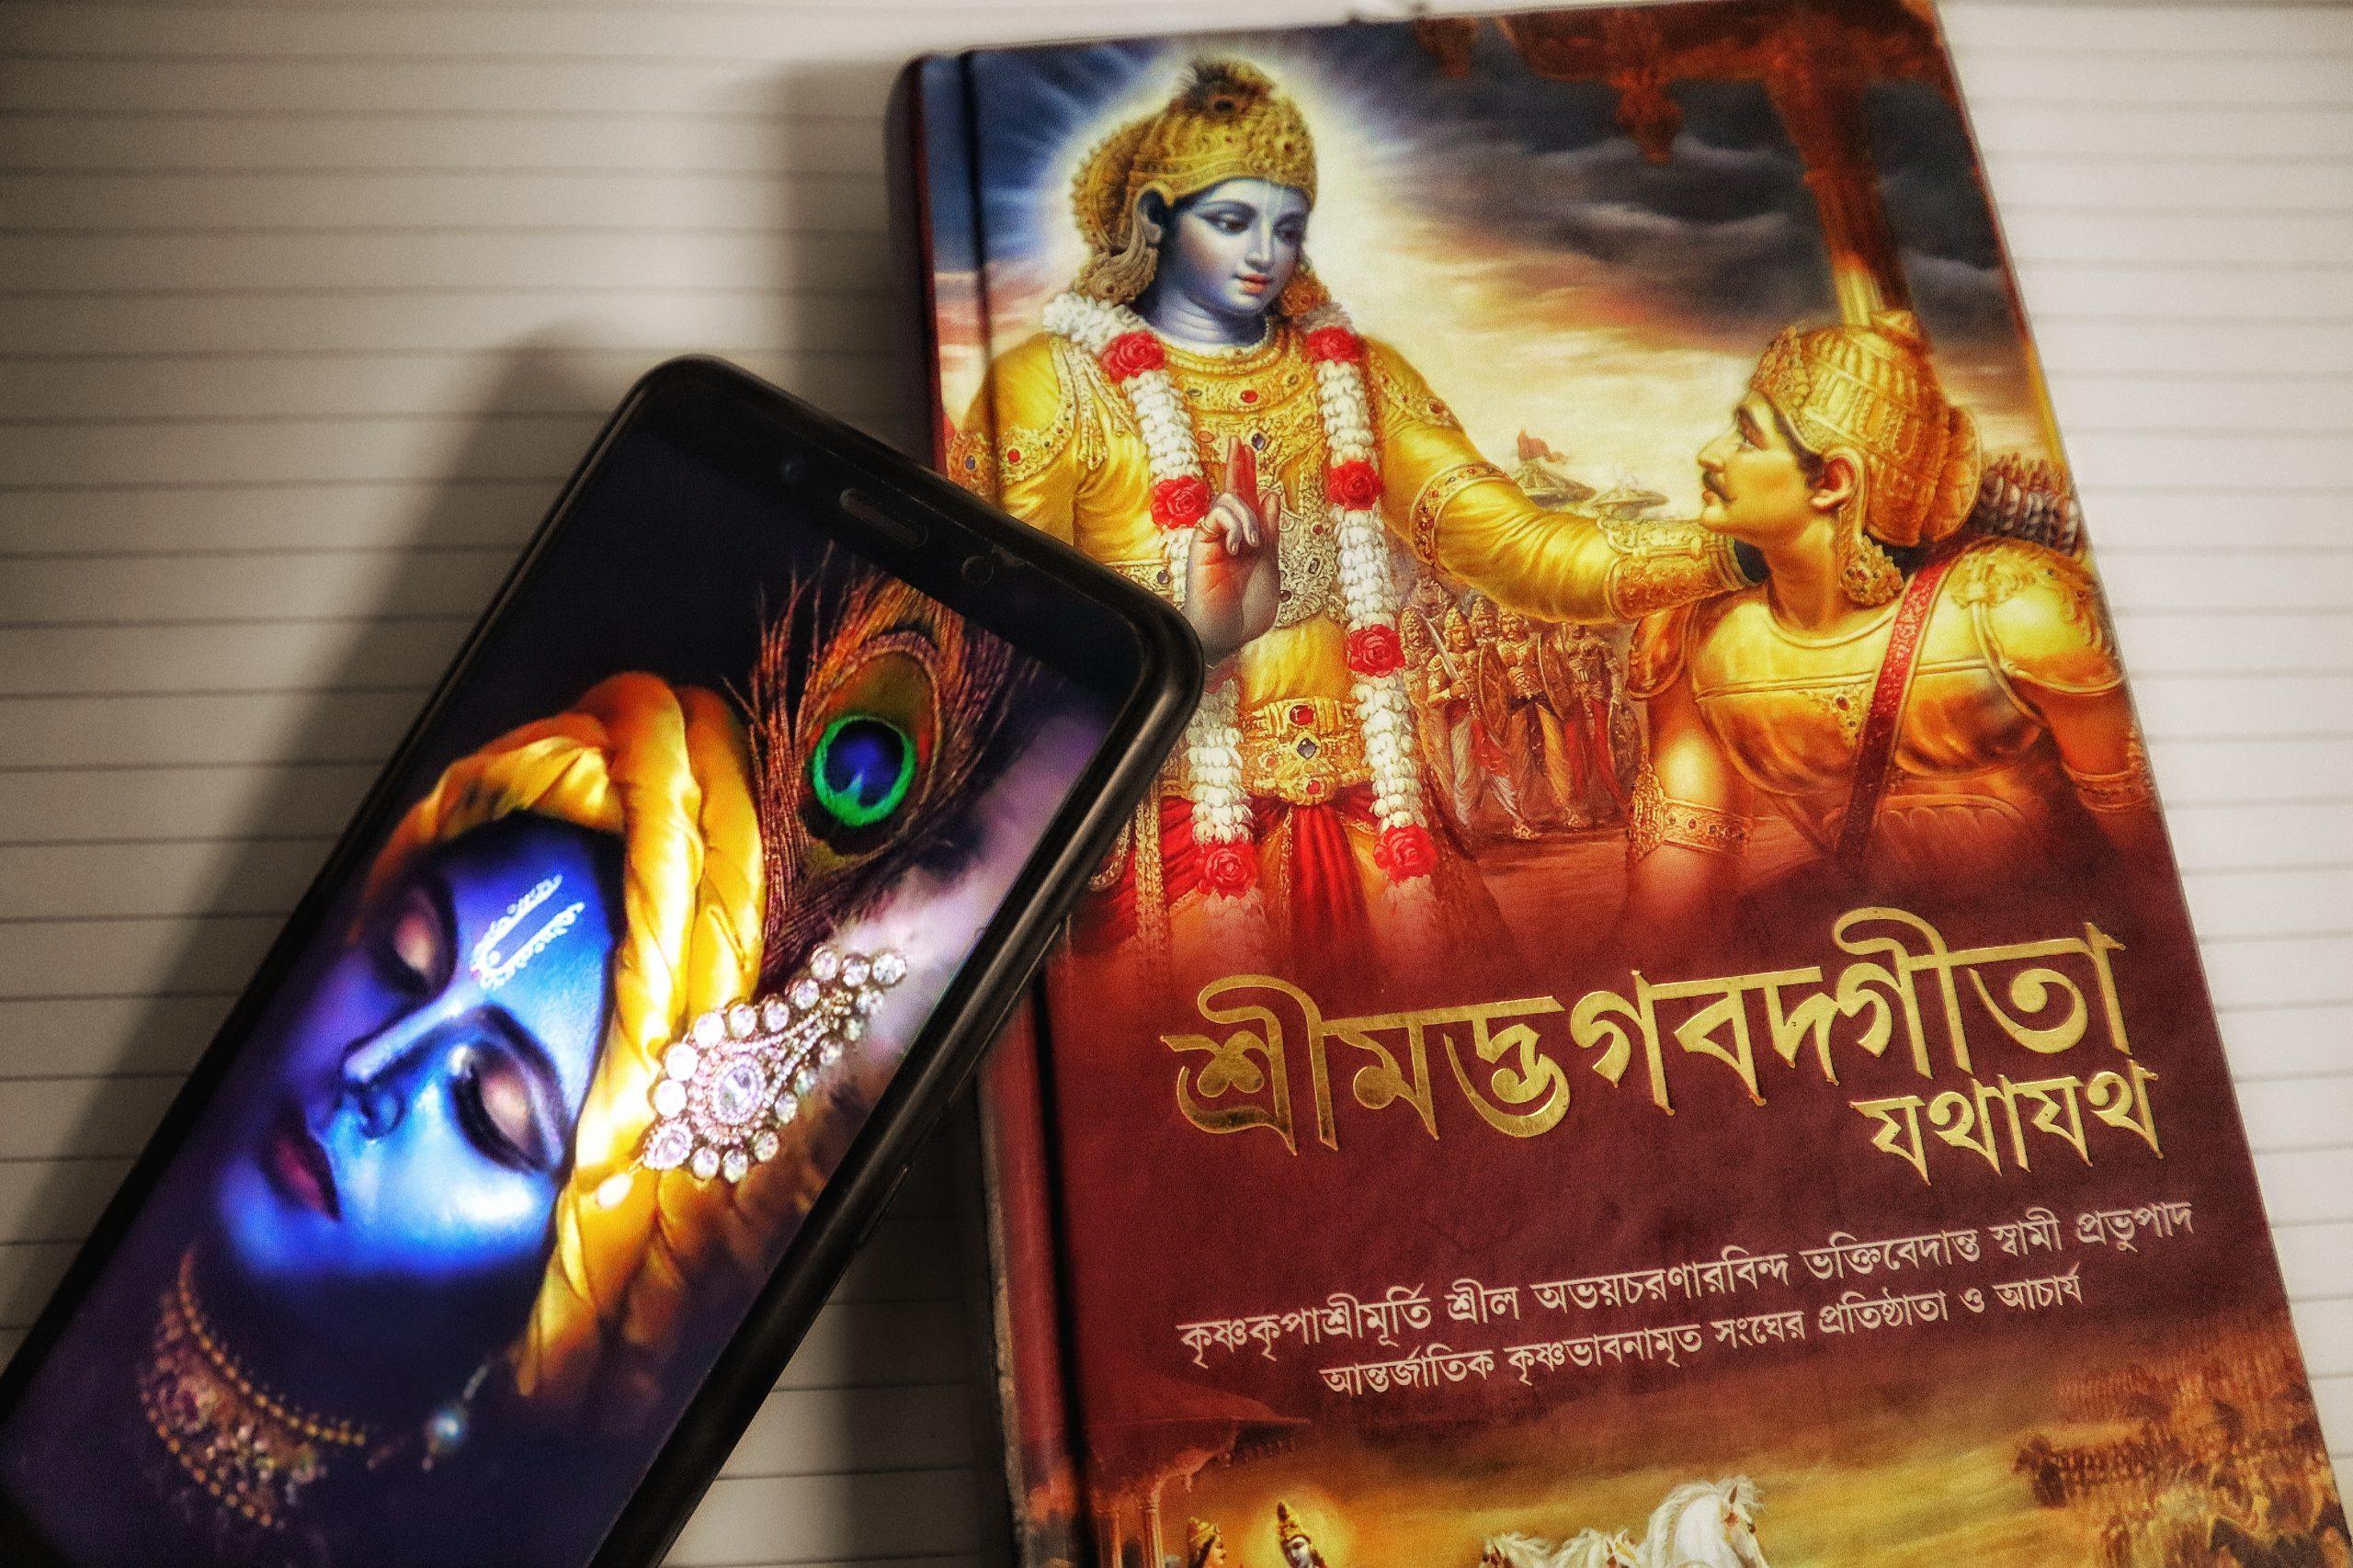 A smartphone and holy Geeta